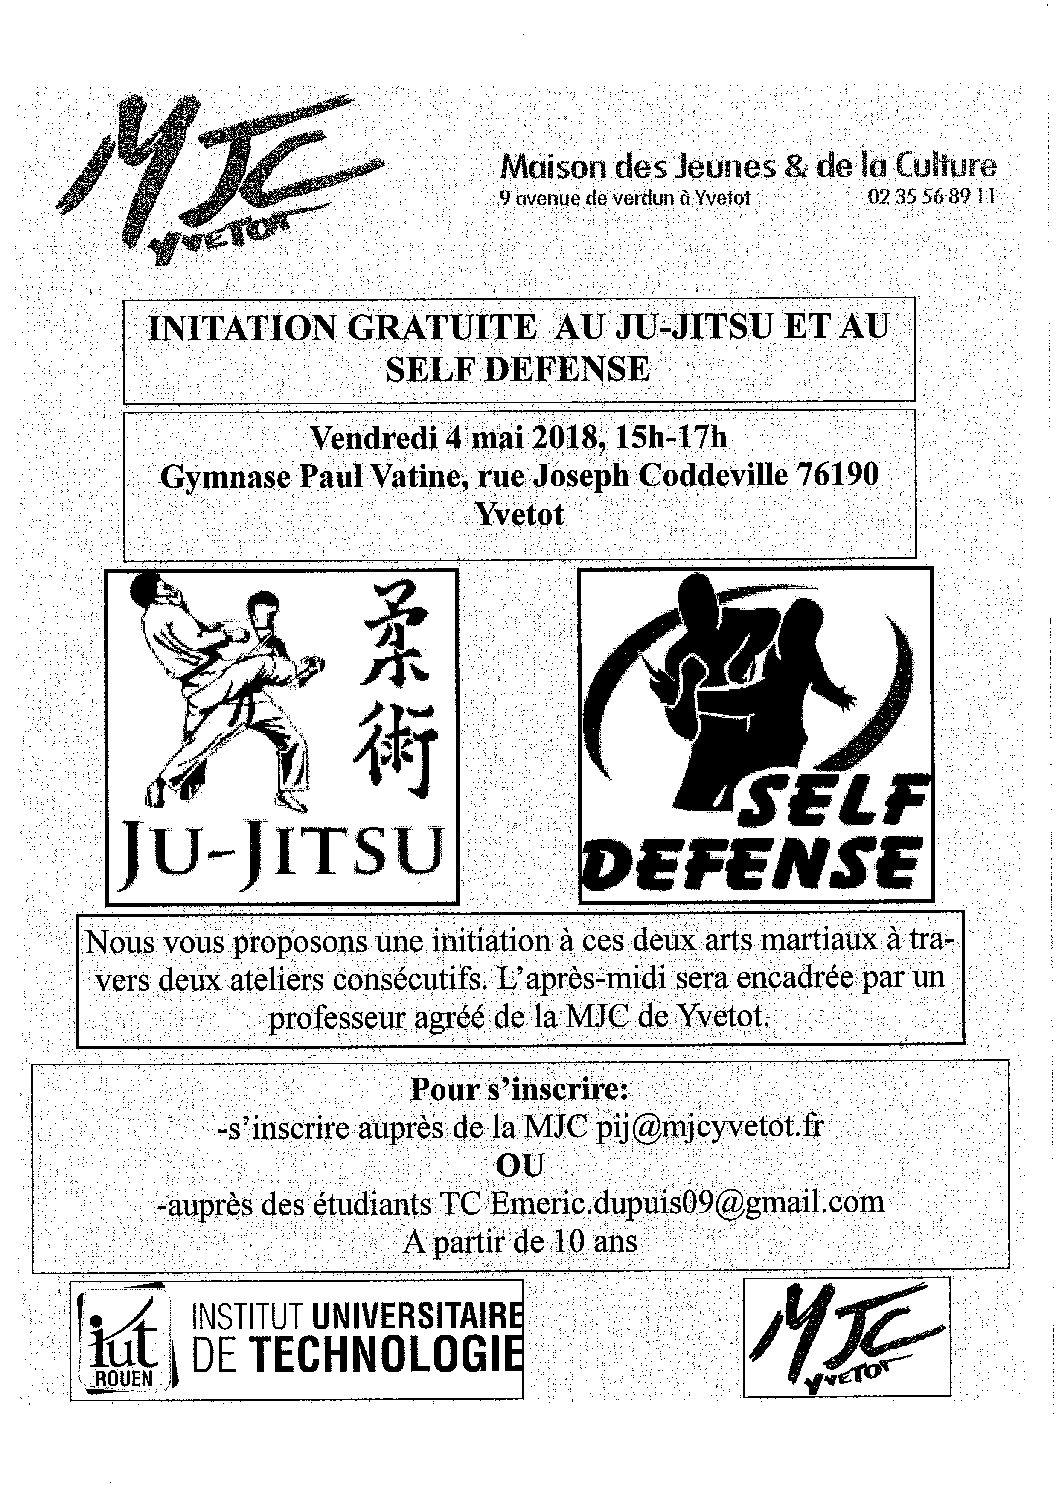 affiche initiation self defense IUT rouen